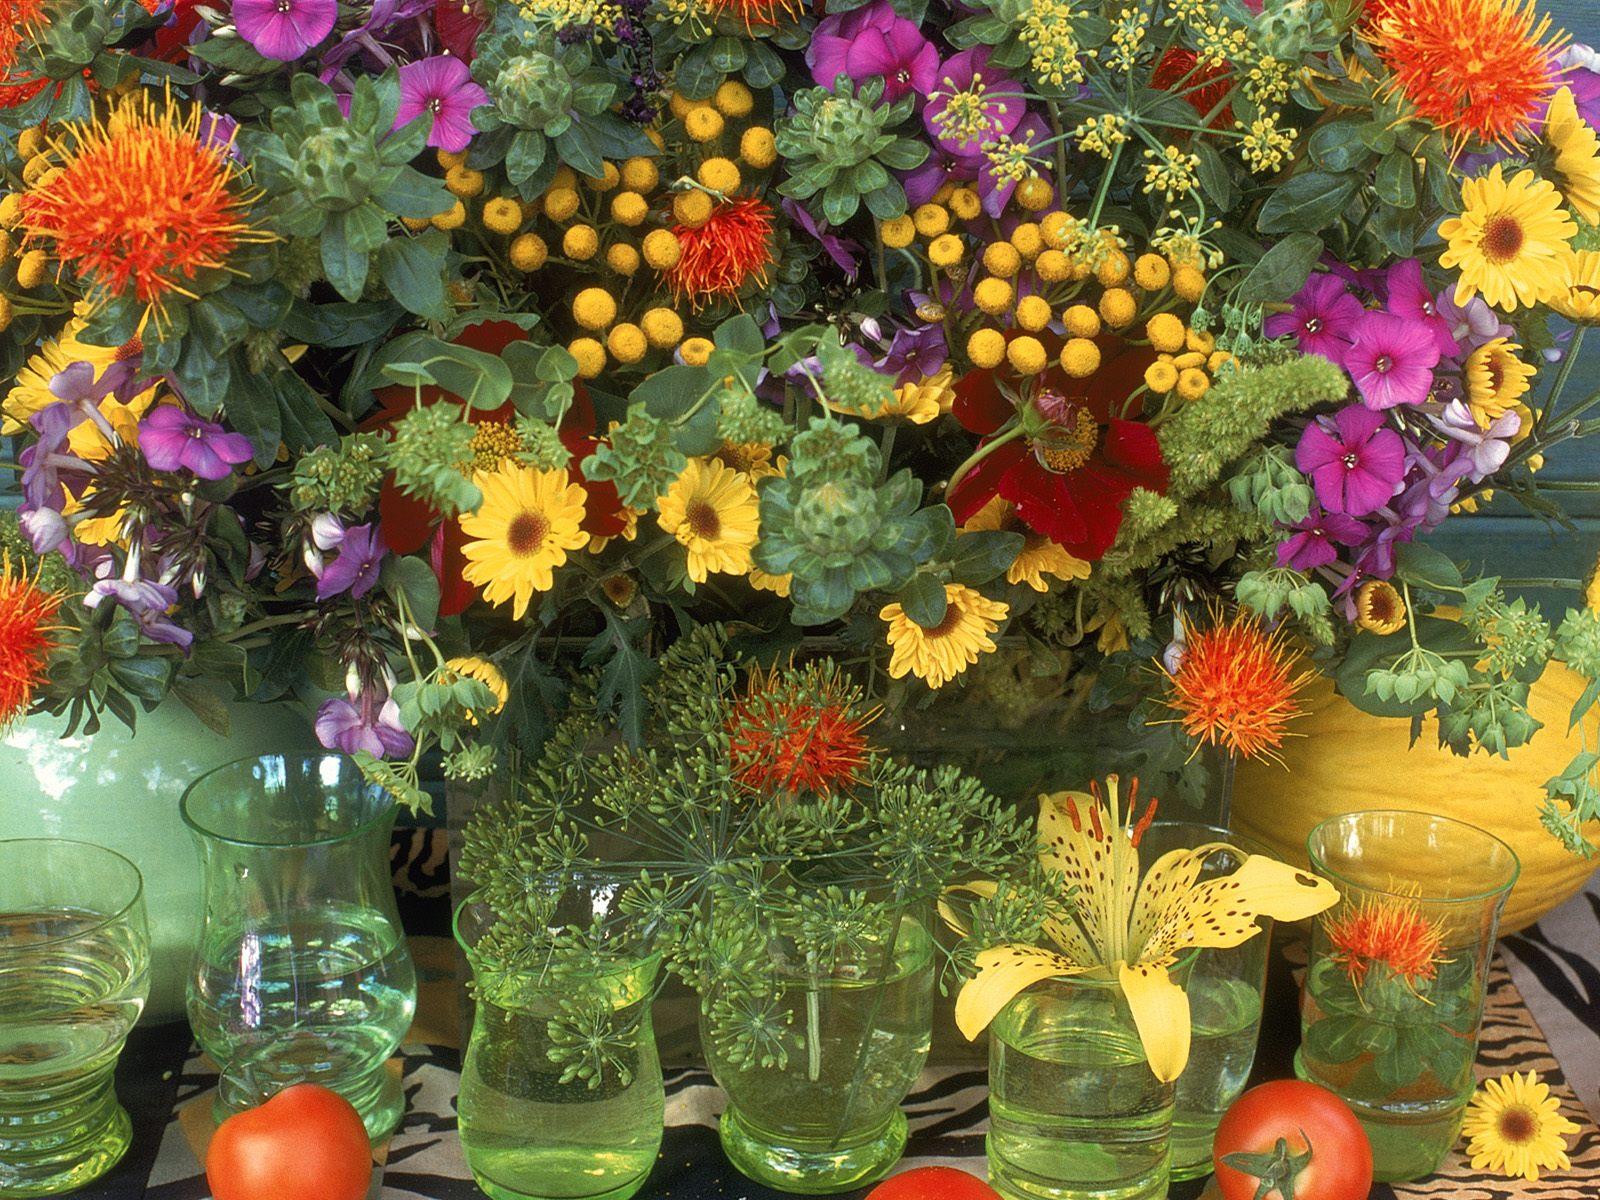 Гелихризум разновидности и выращивание из семян в